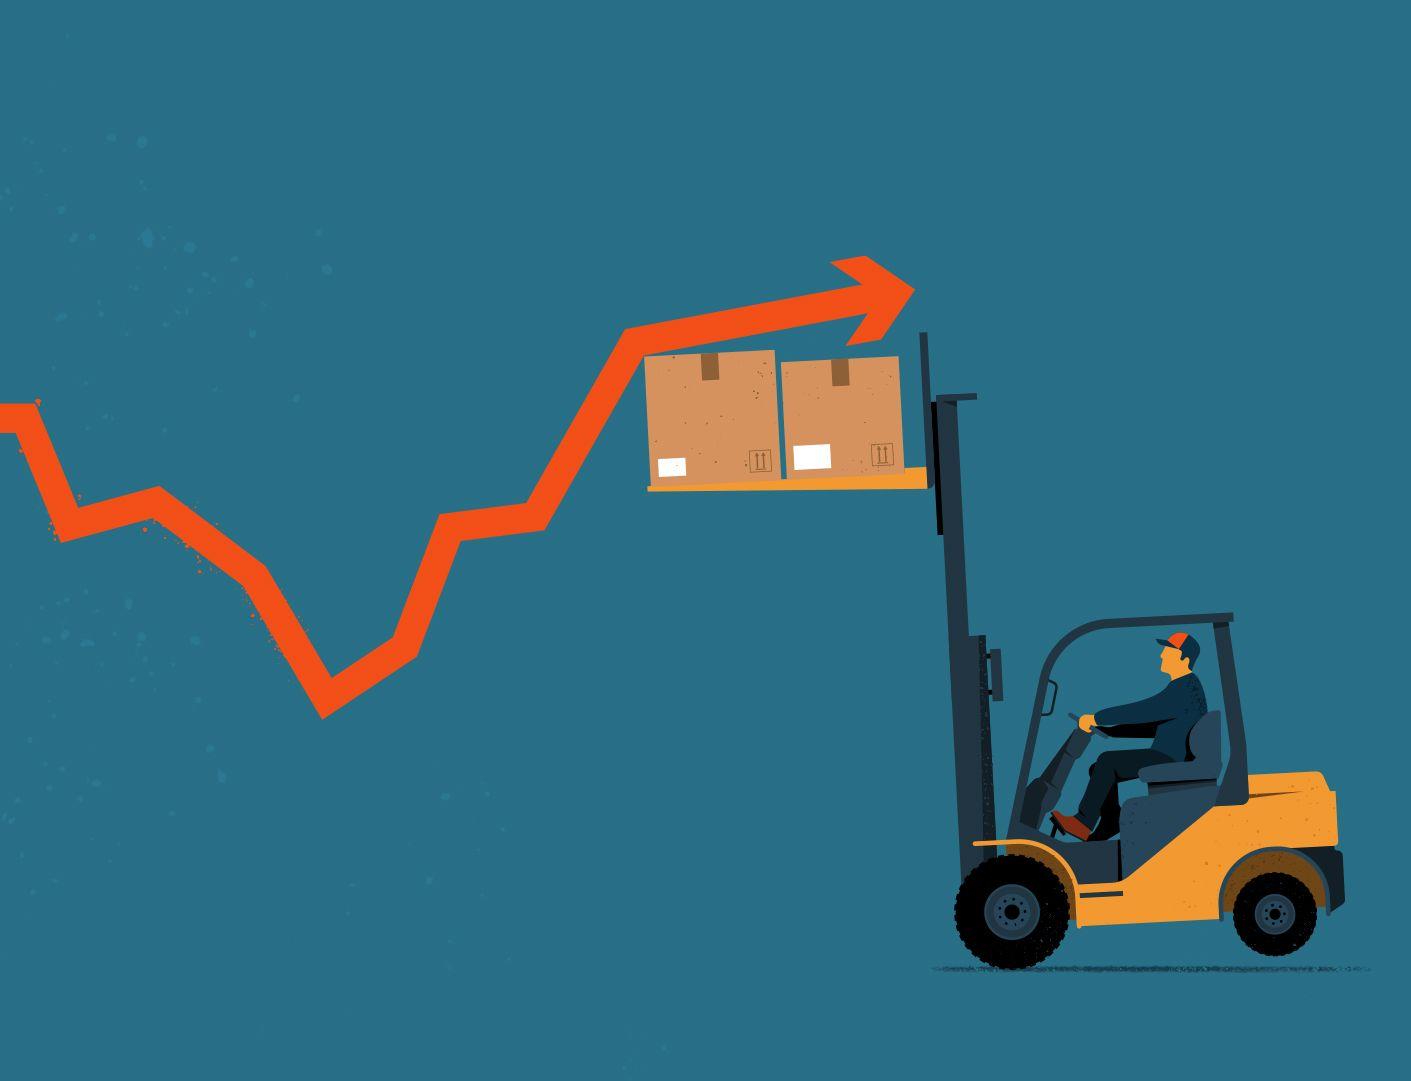 garance-illustration-LExpress-Logistics-during-the-pandemic_web